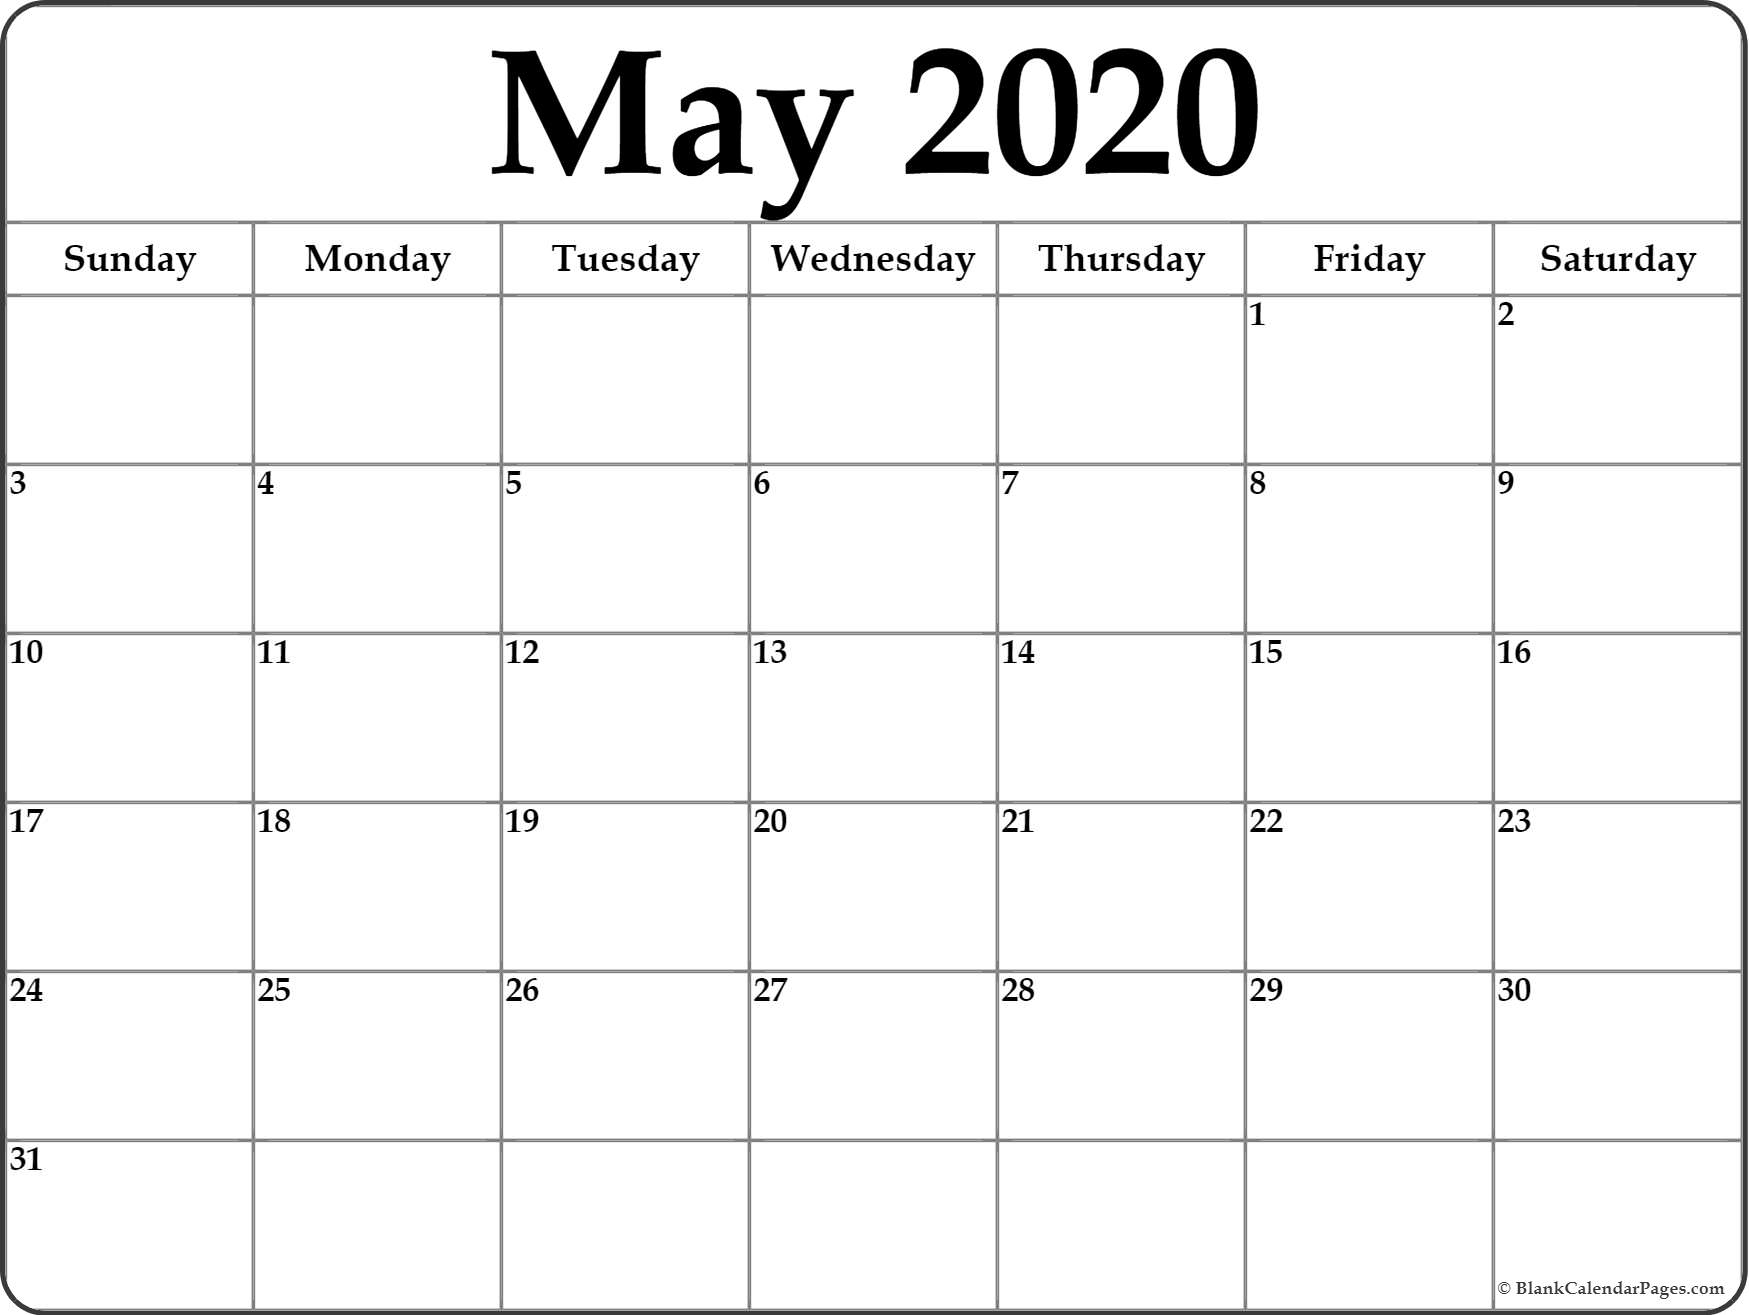 May 2020 Calendar | Free Printable Monthly Calendars throughout Blank Calendar 2020 Printable Monthly